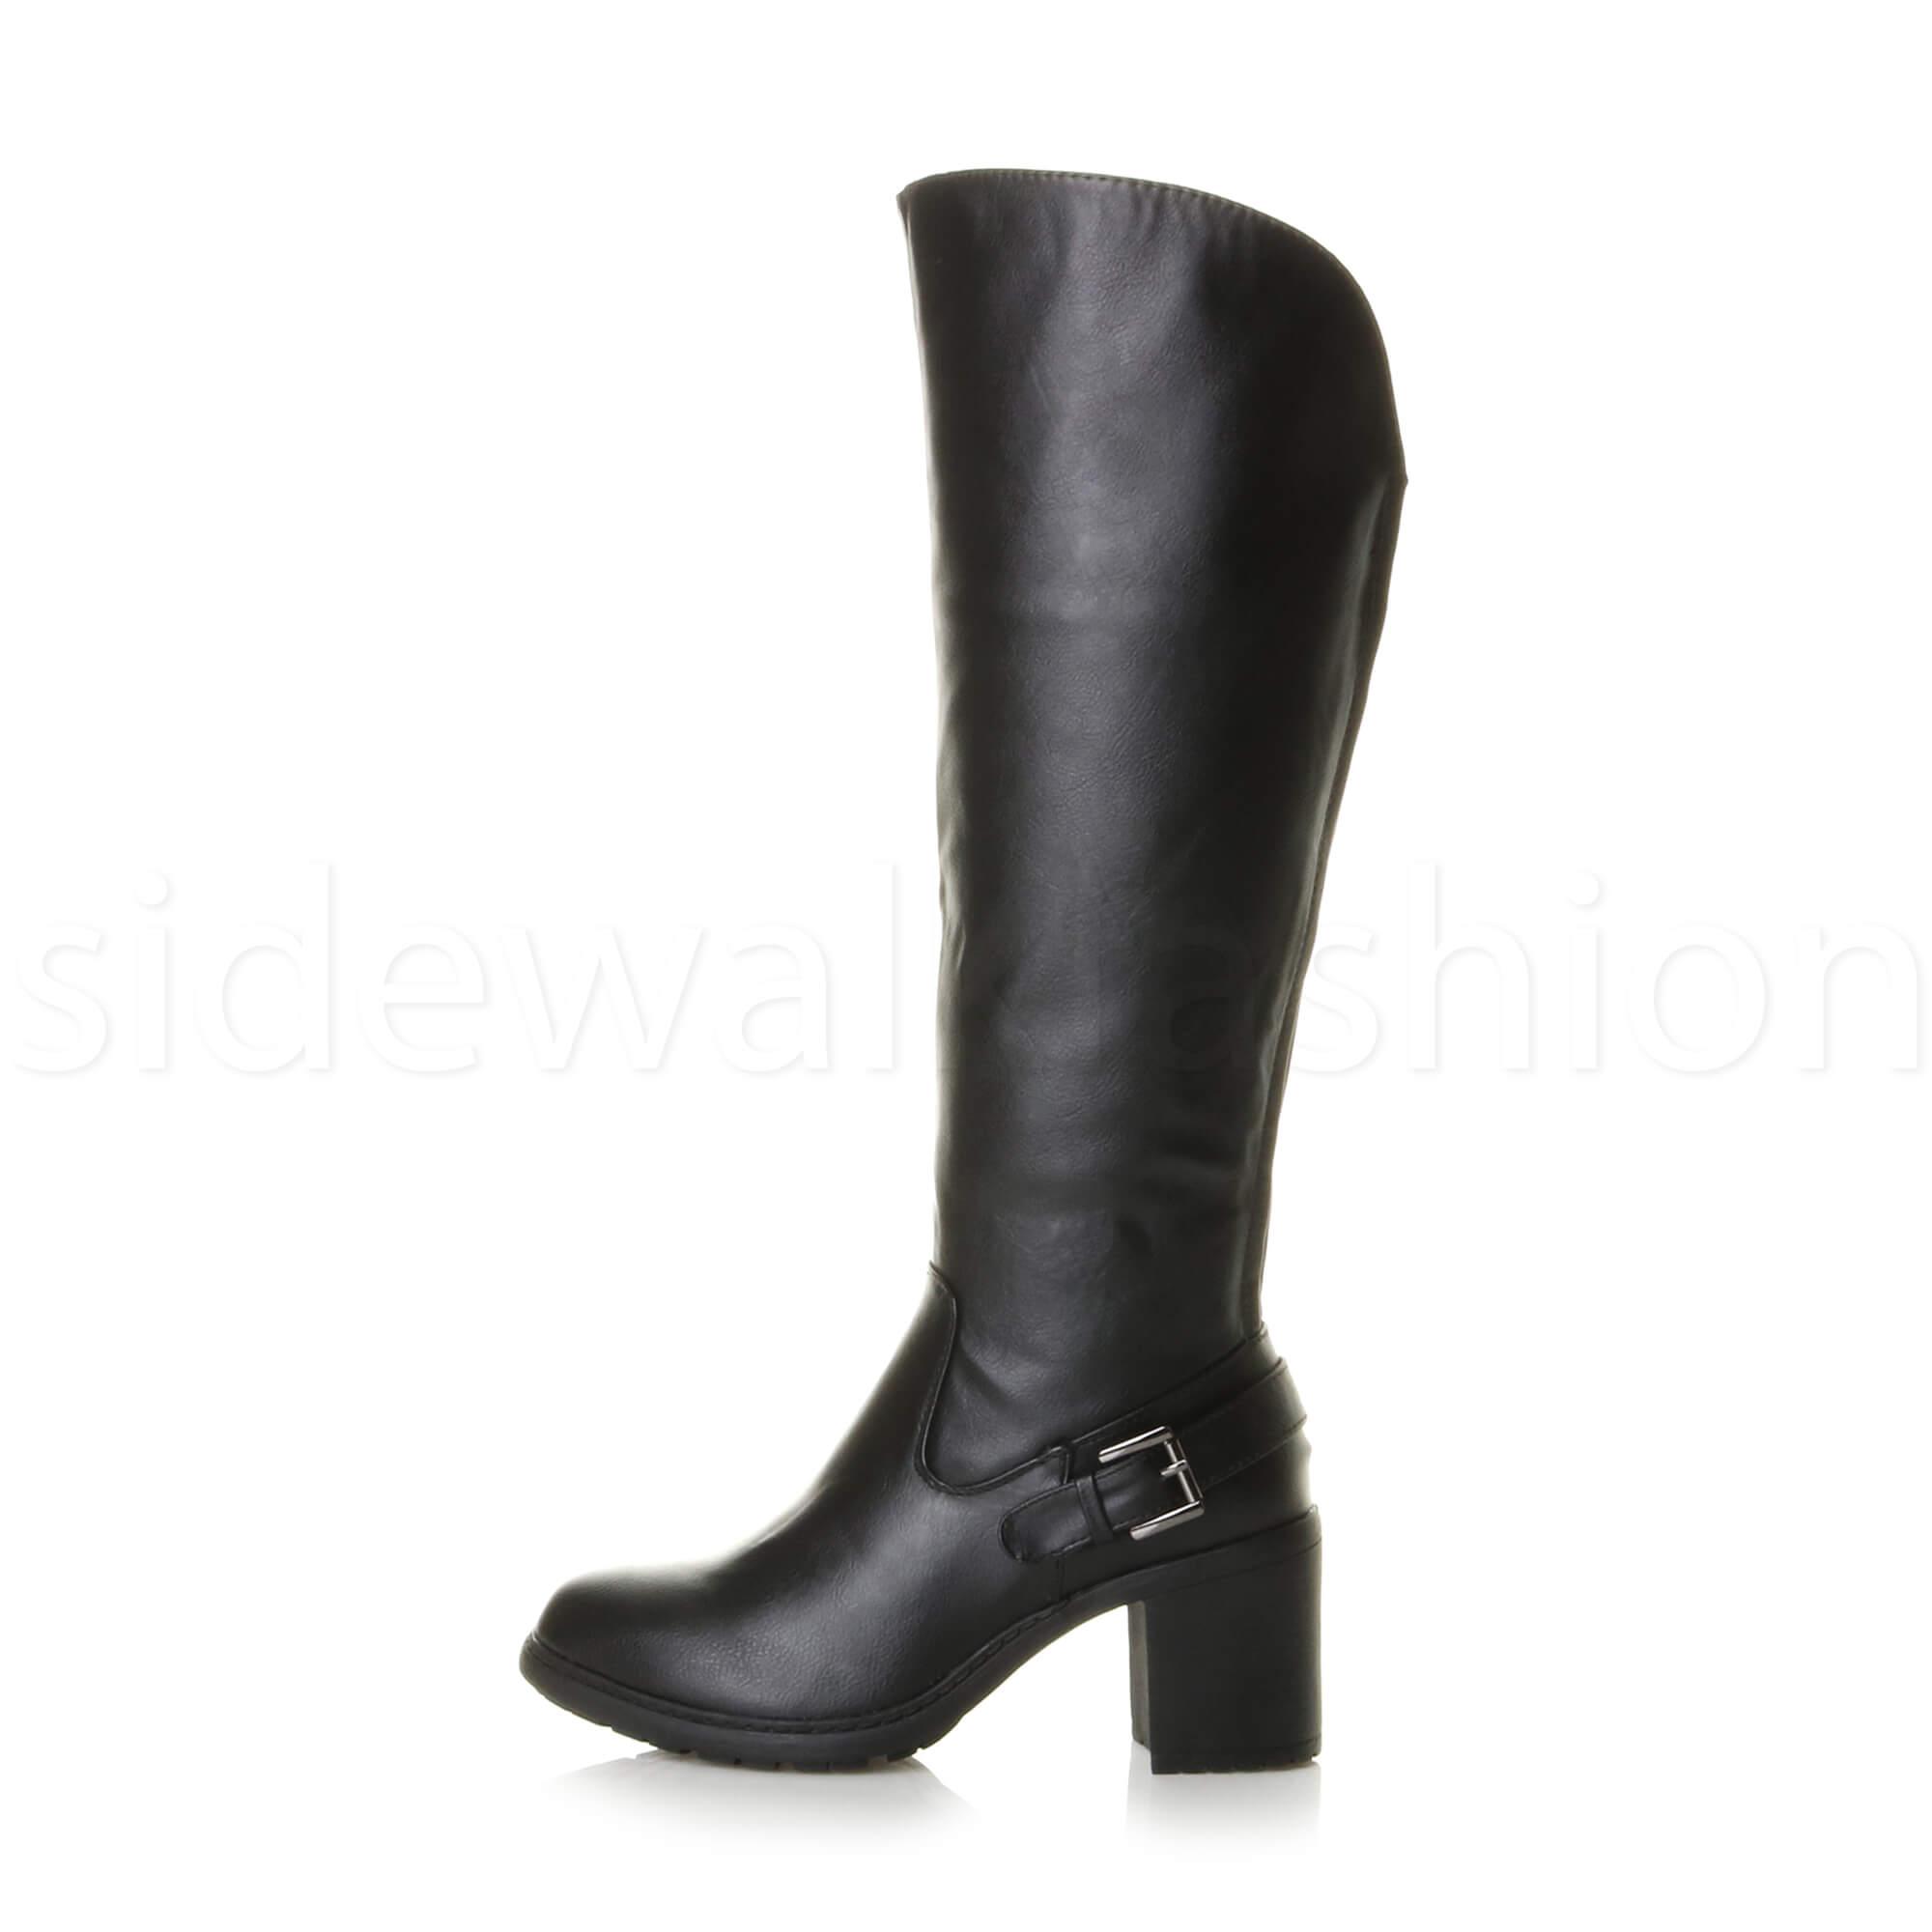 c33cbcc8098a Womens ladies block high heel wide calf zip stretch biker riding ...